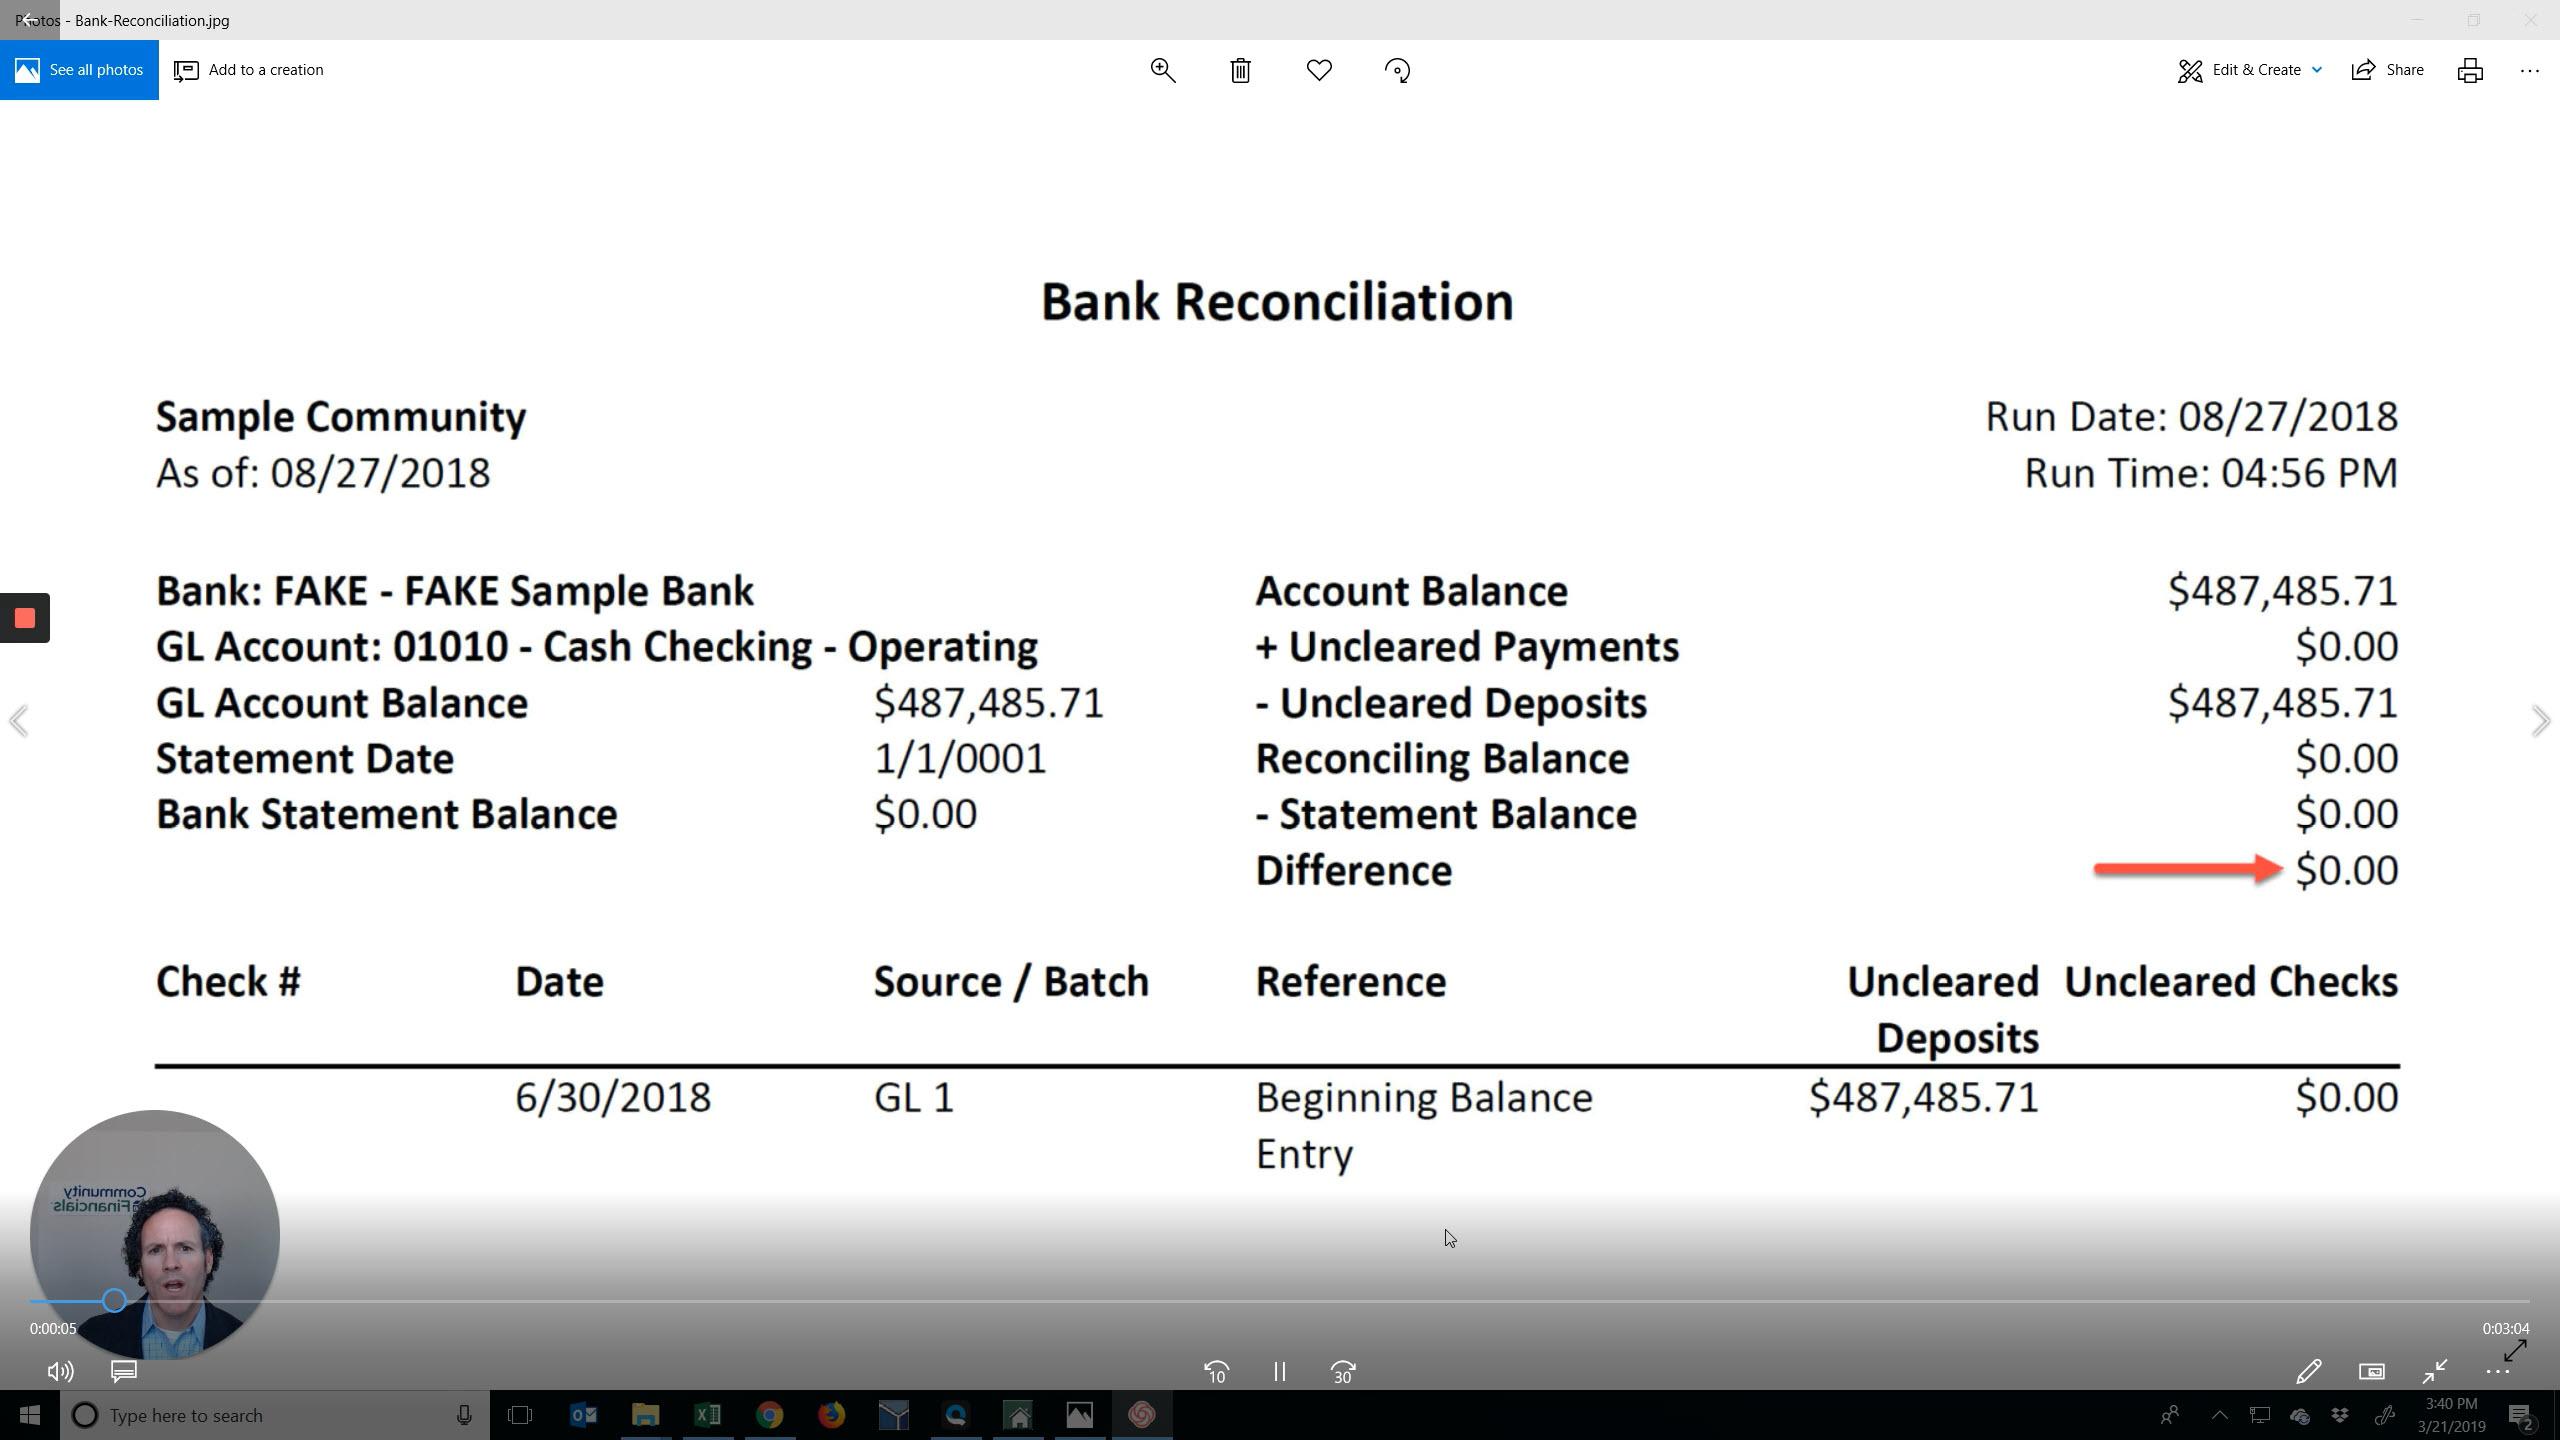 Bank Reconciliation Video Thumbnail